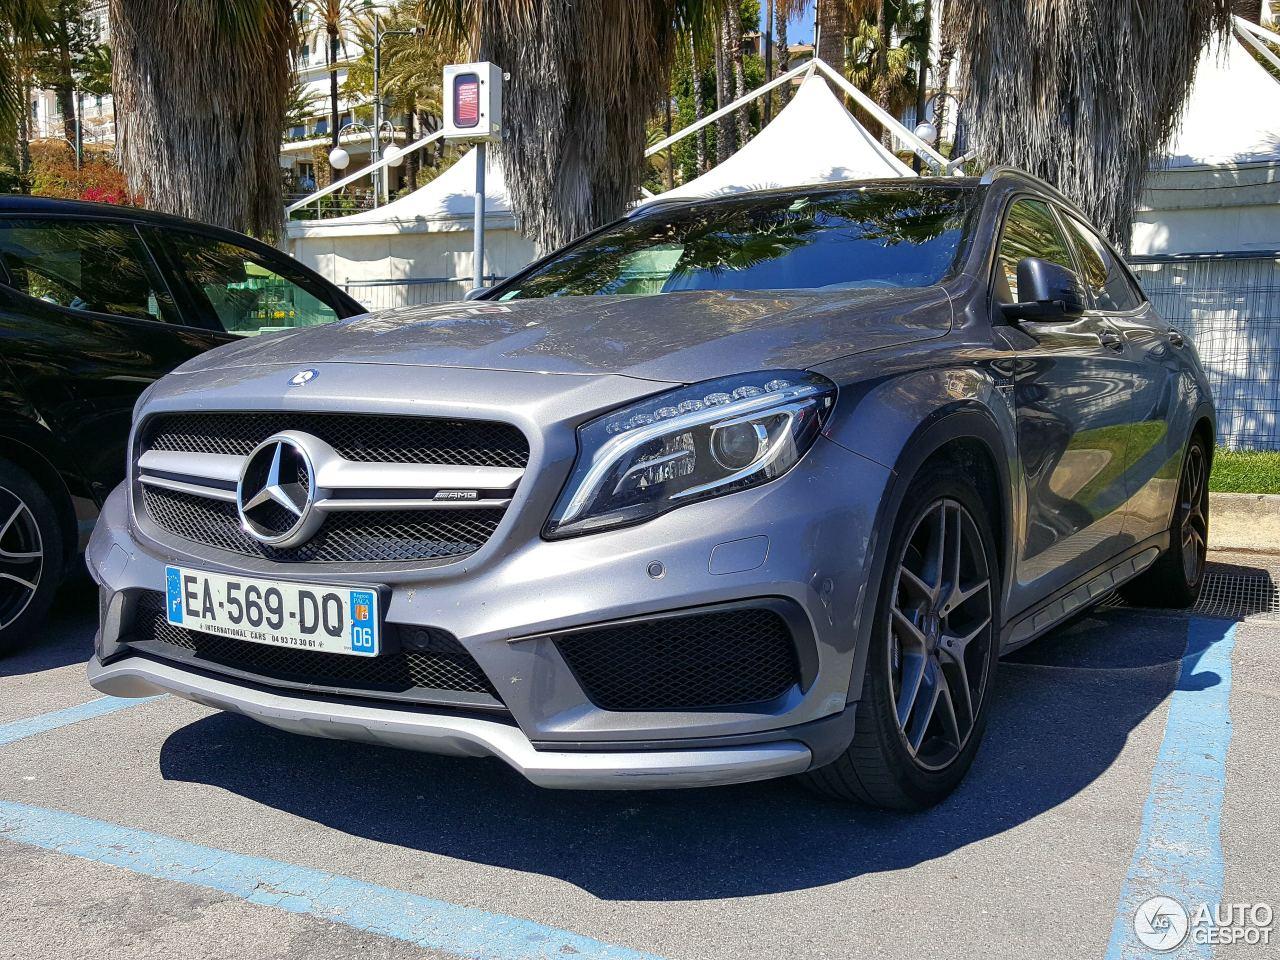 Mercedes benz gla 45 amg x156 21 mei 2017 autogespot for 2017 amg gla 45 mercedes benz